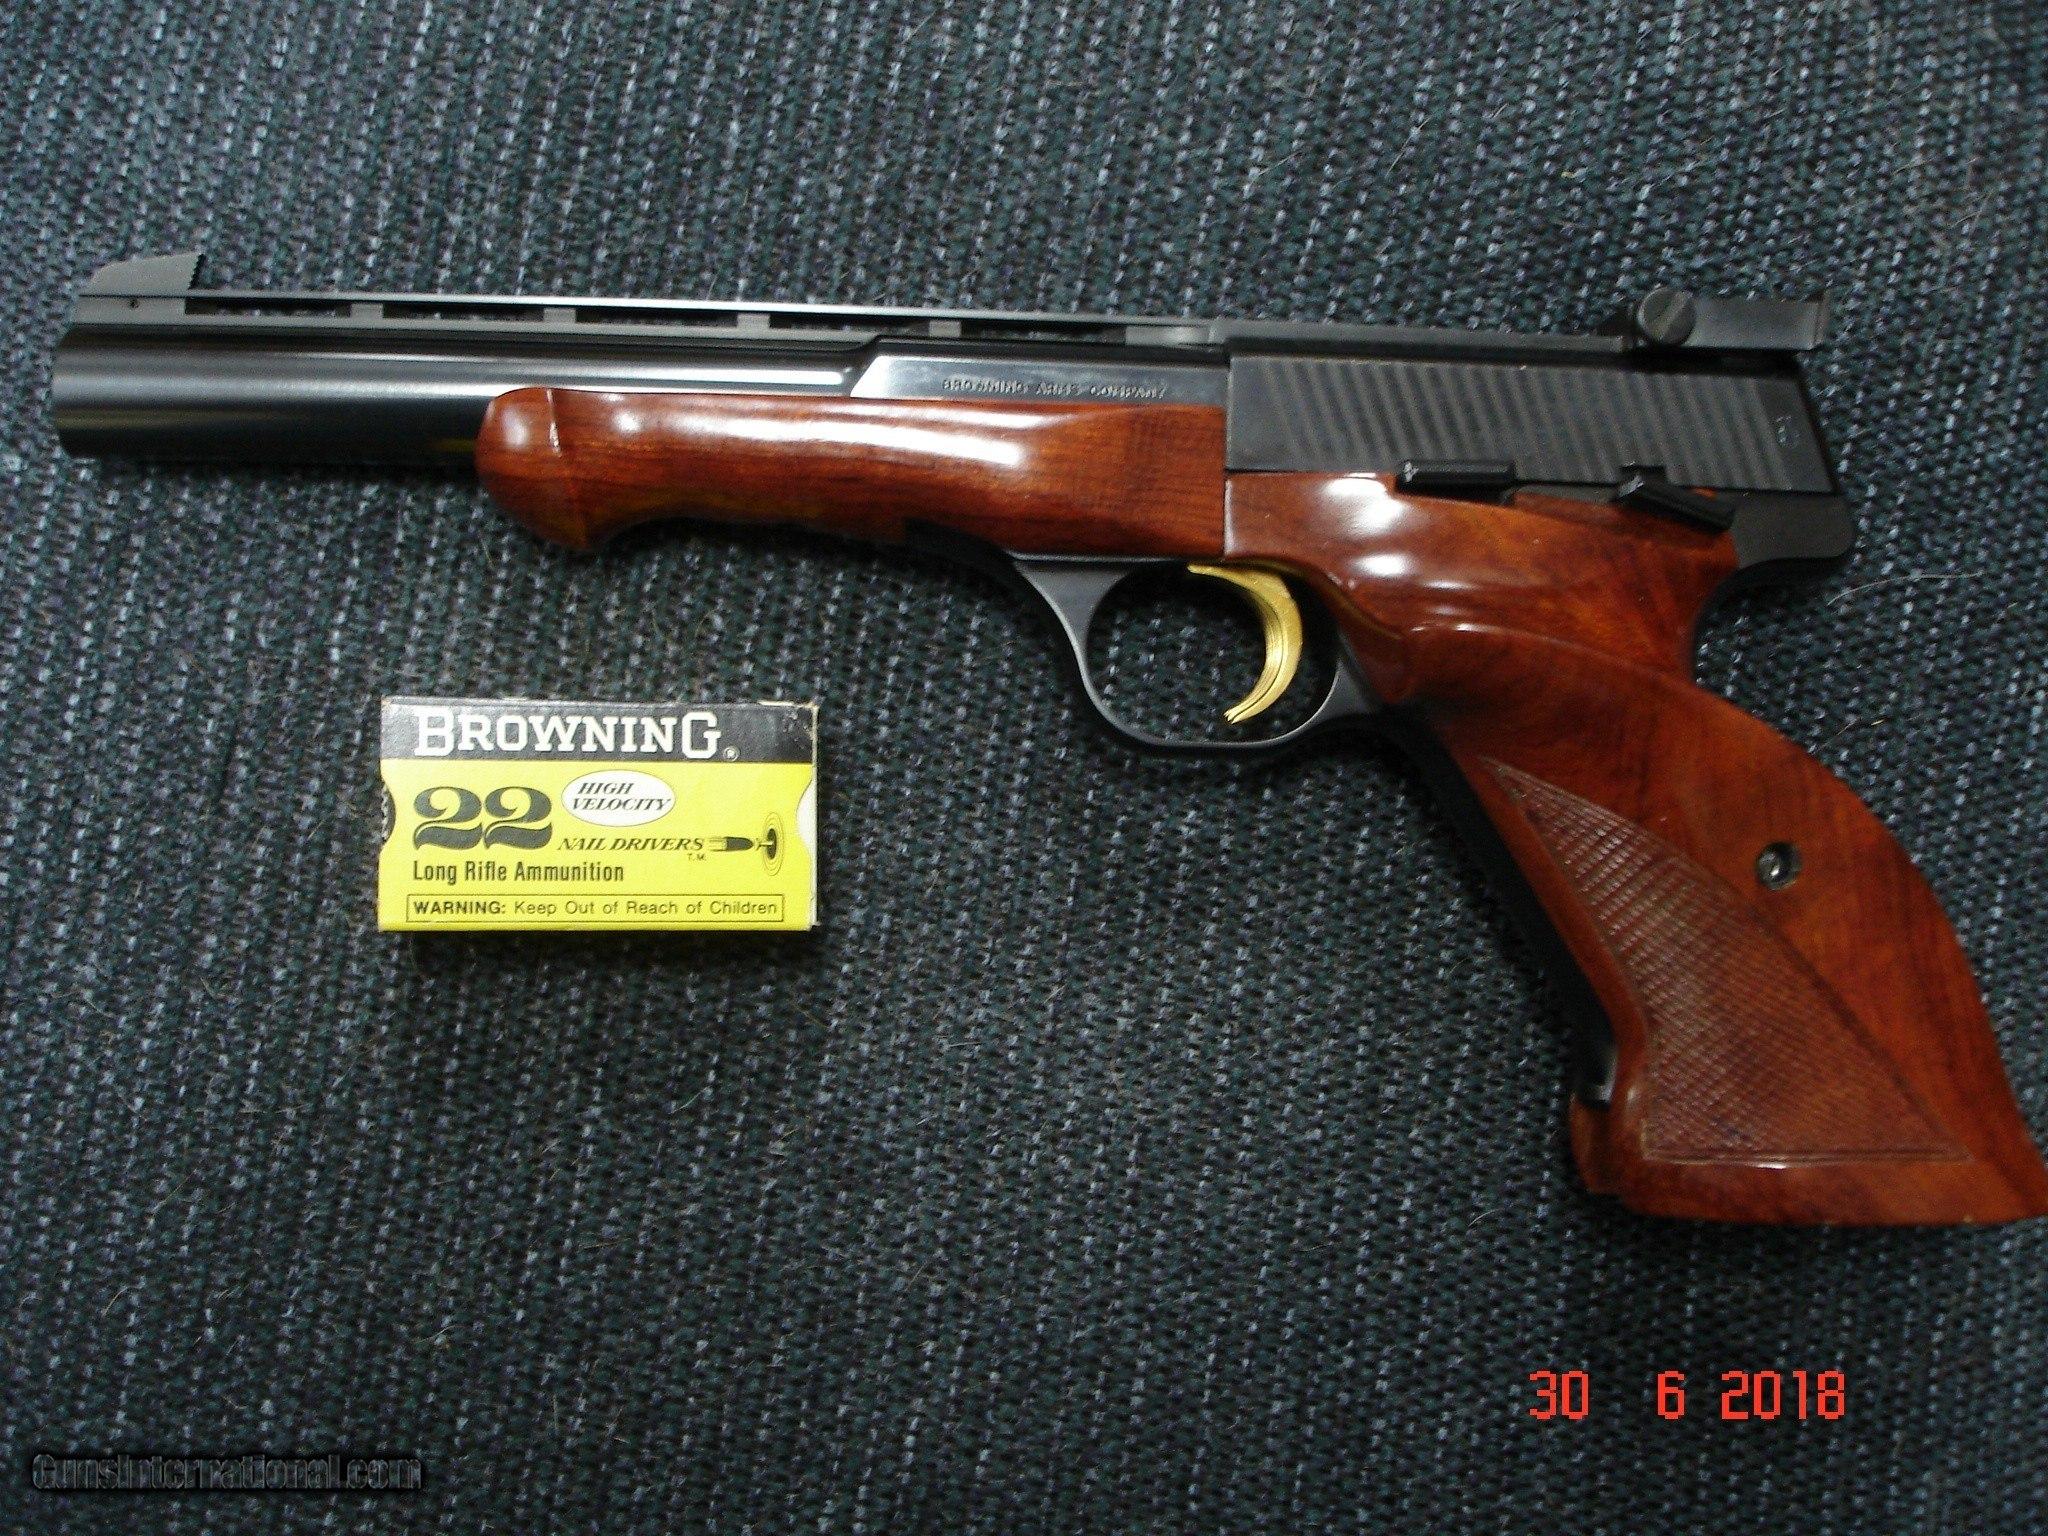 browning medalist mfg 1969 mic hard case tools owners manual etc rh gunsinternational com Cooper Firearms Company Cooper Model 21 Varminter